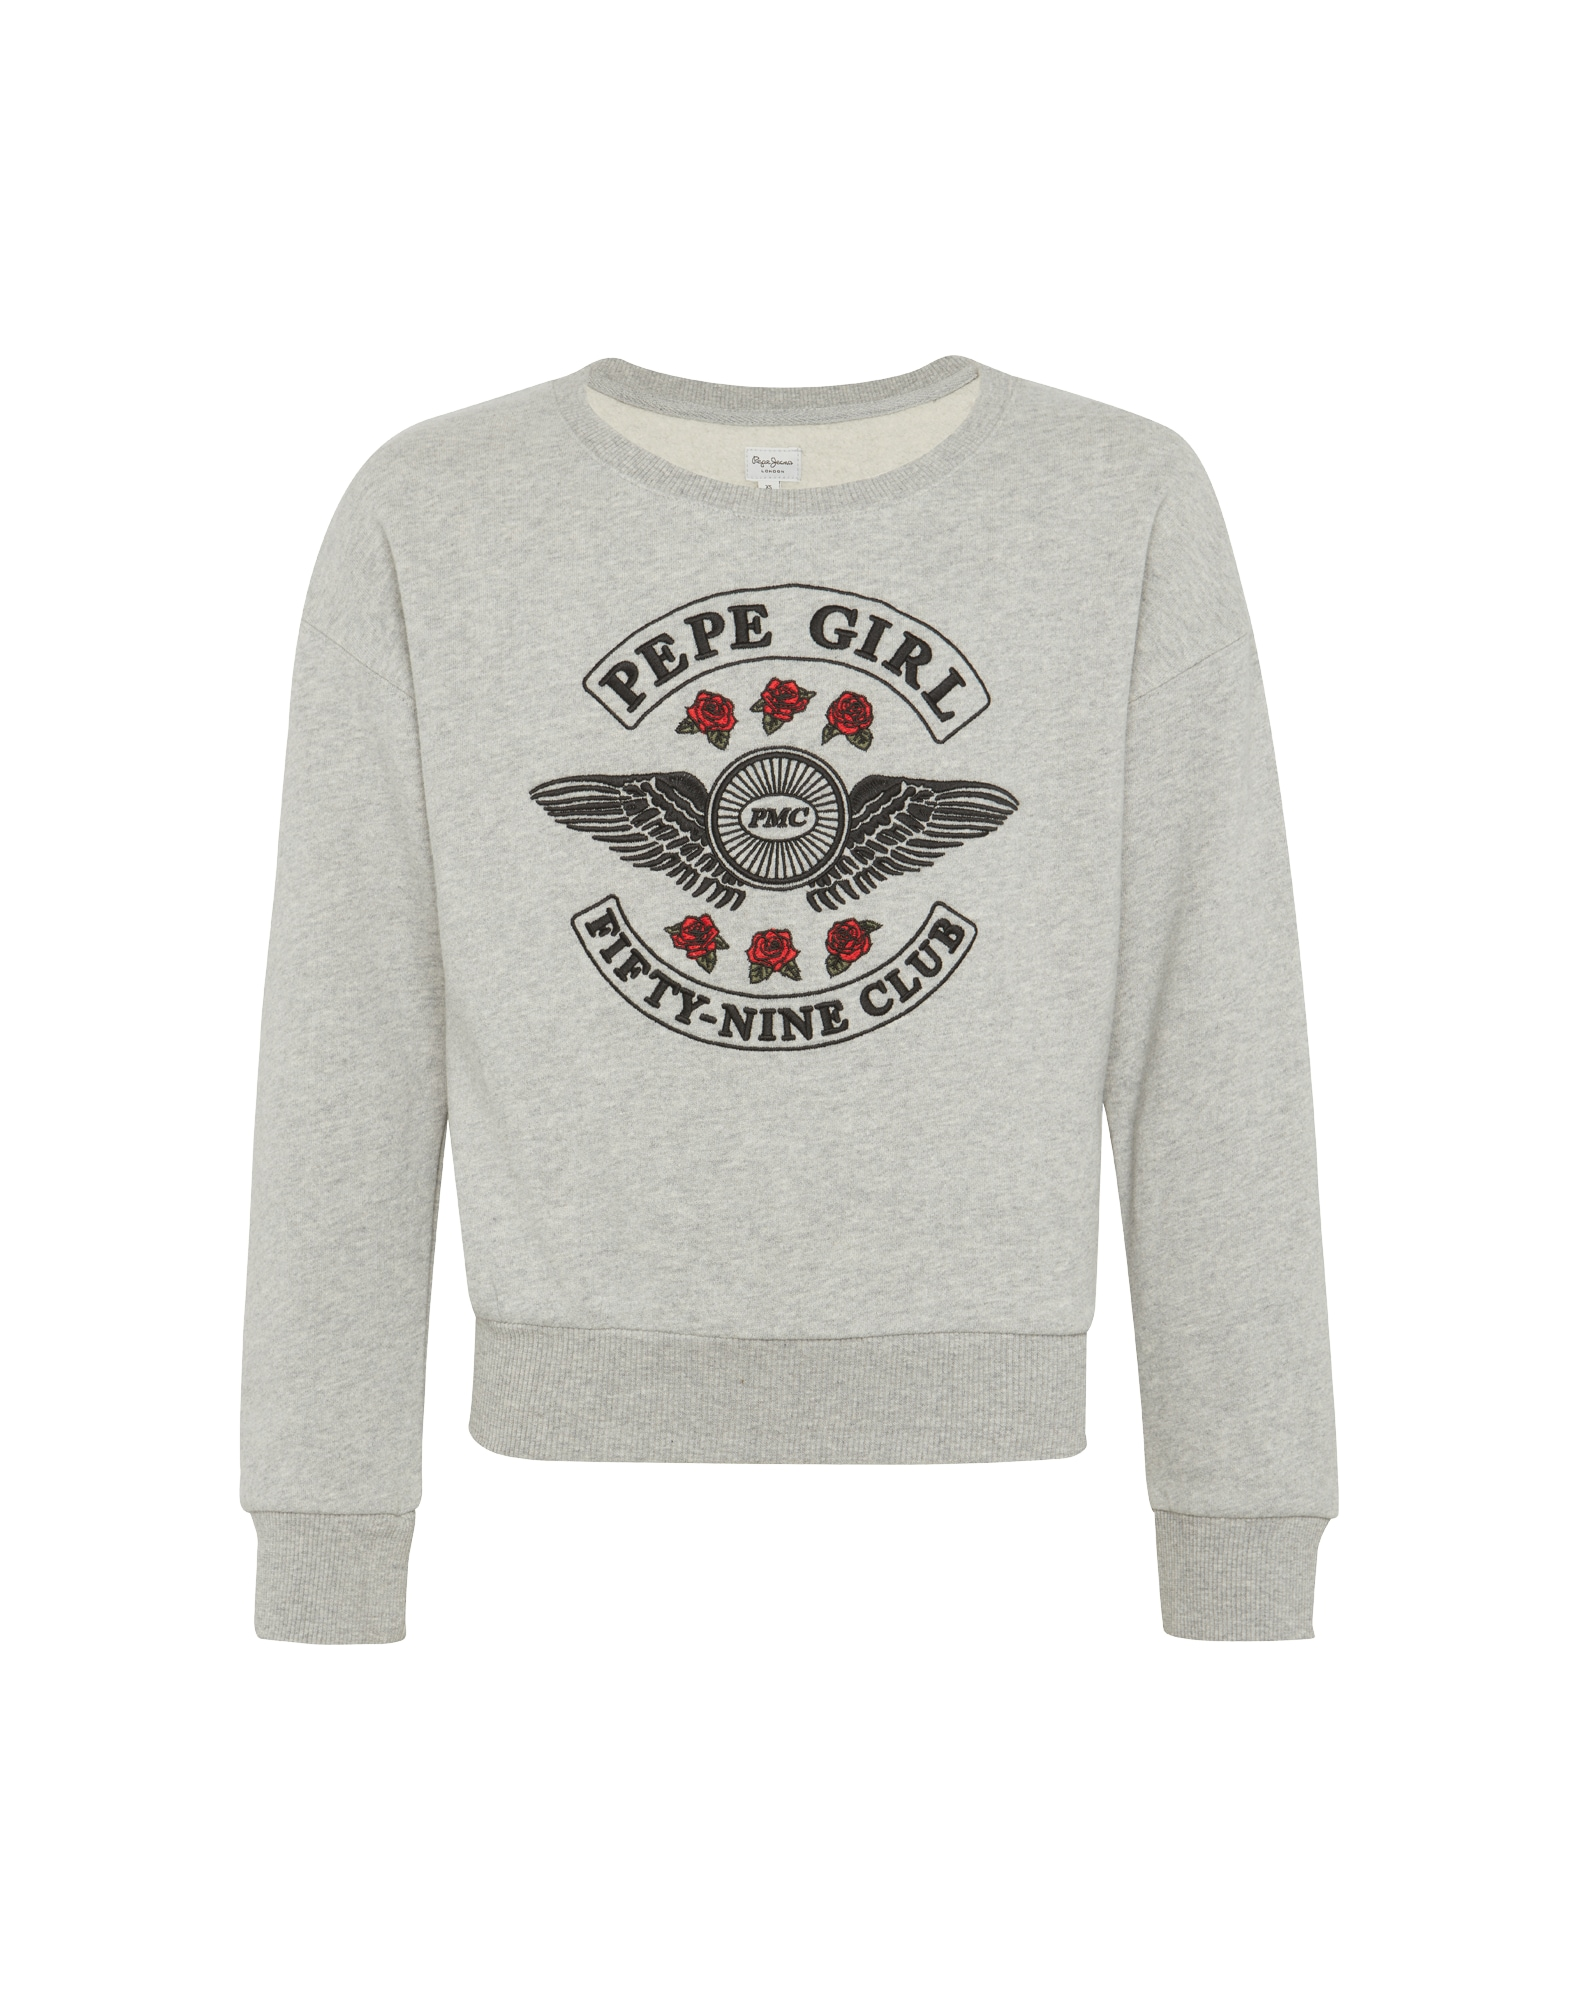 Pepe Jeans Meisjes Sweatshirt SONGA TEEN grijs gemêleerd